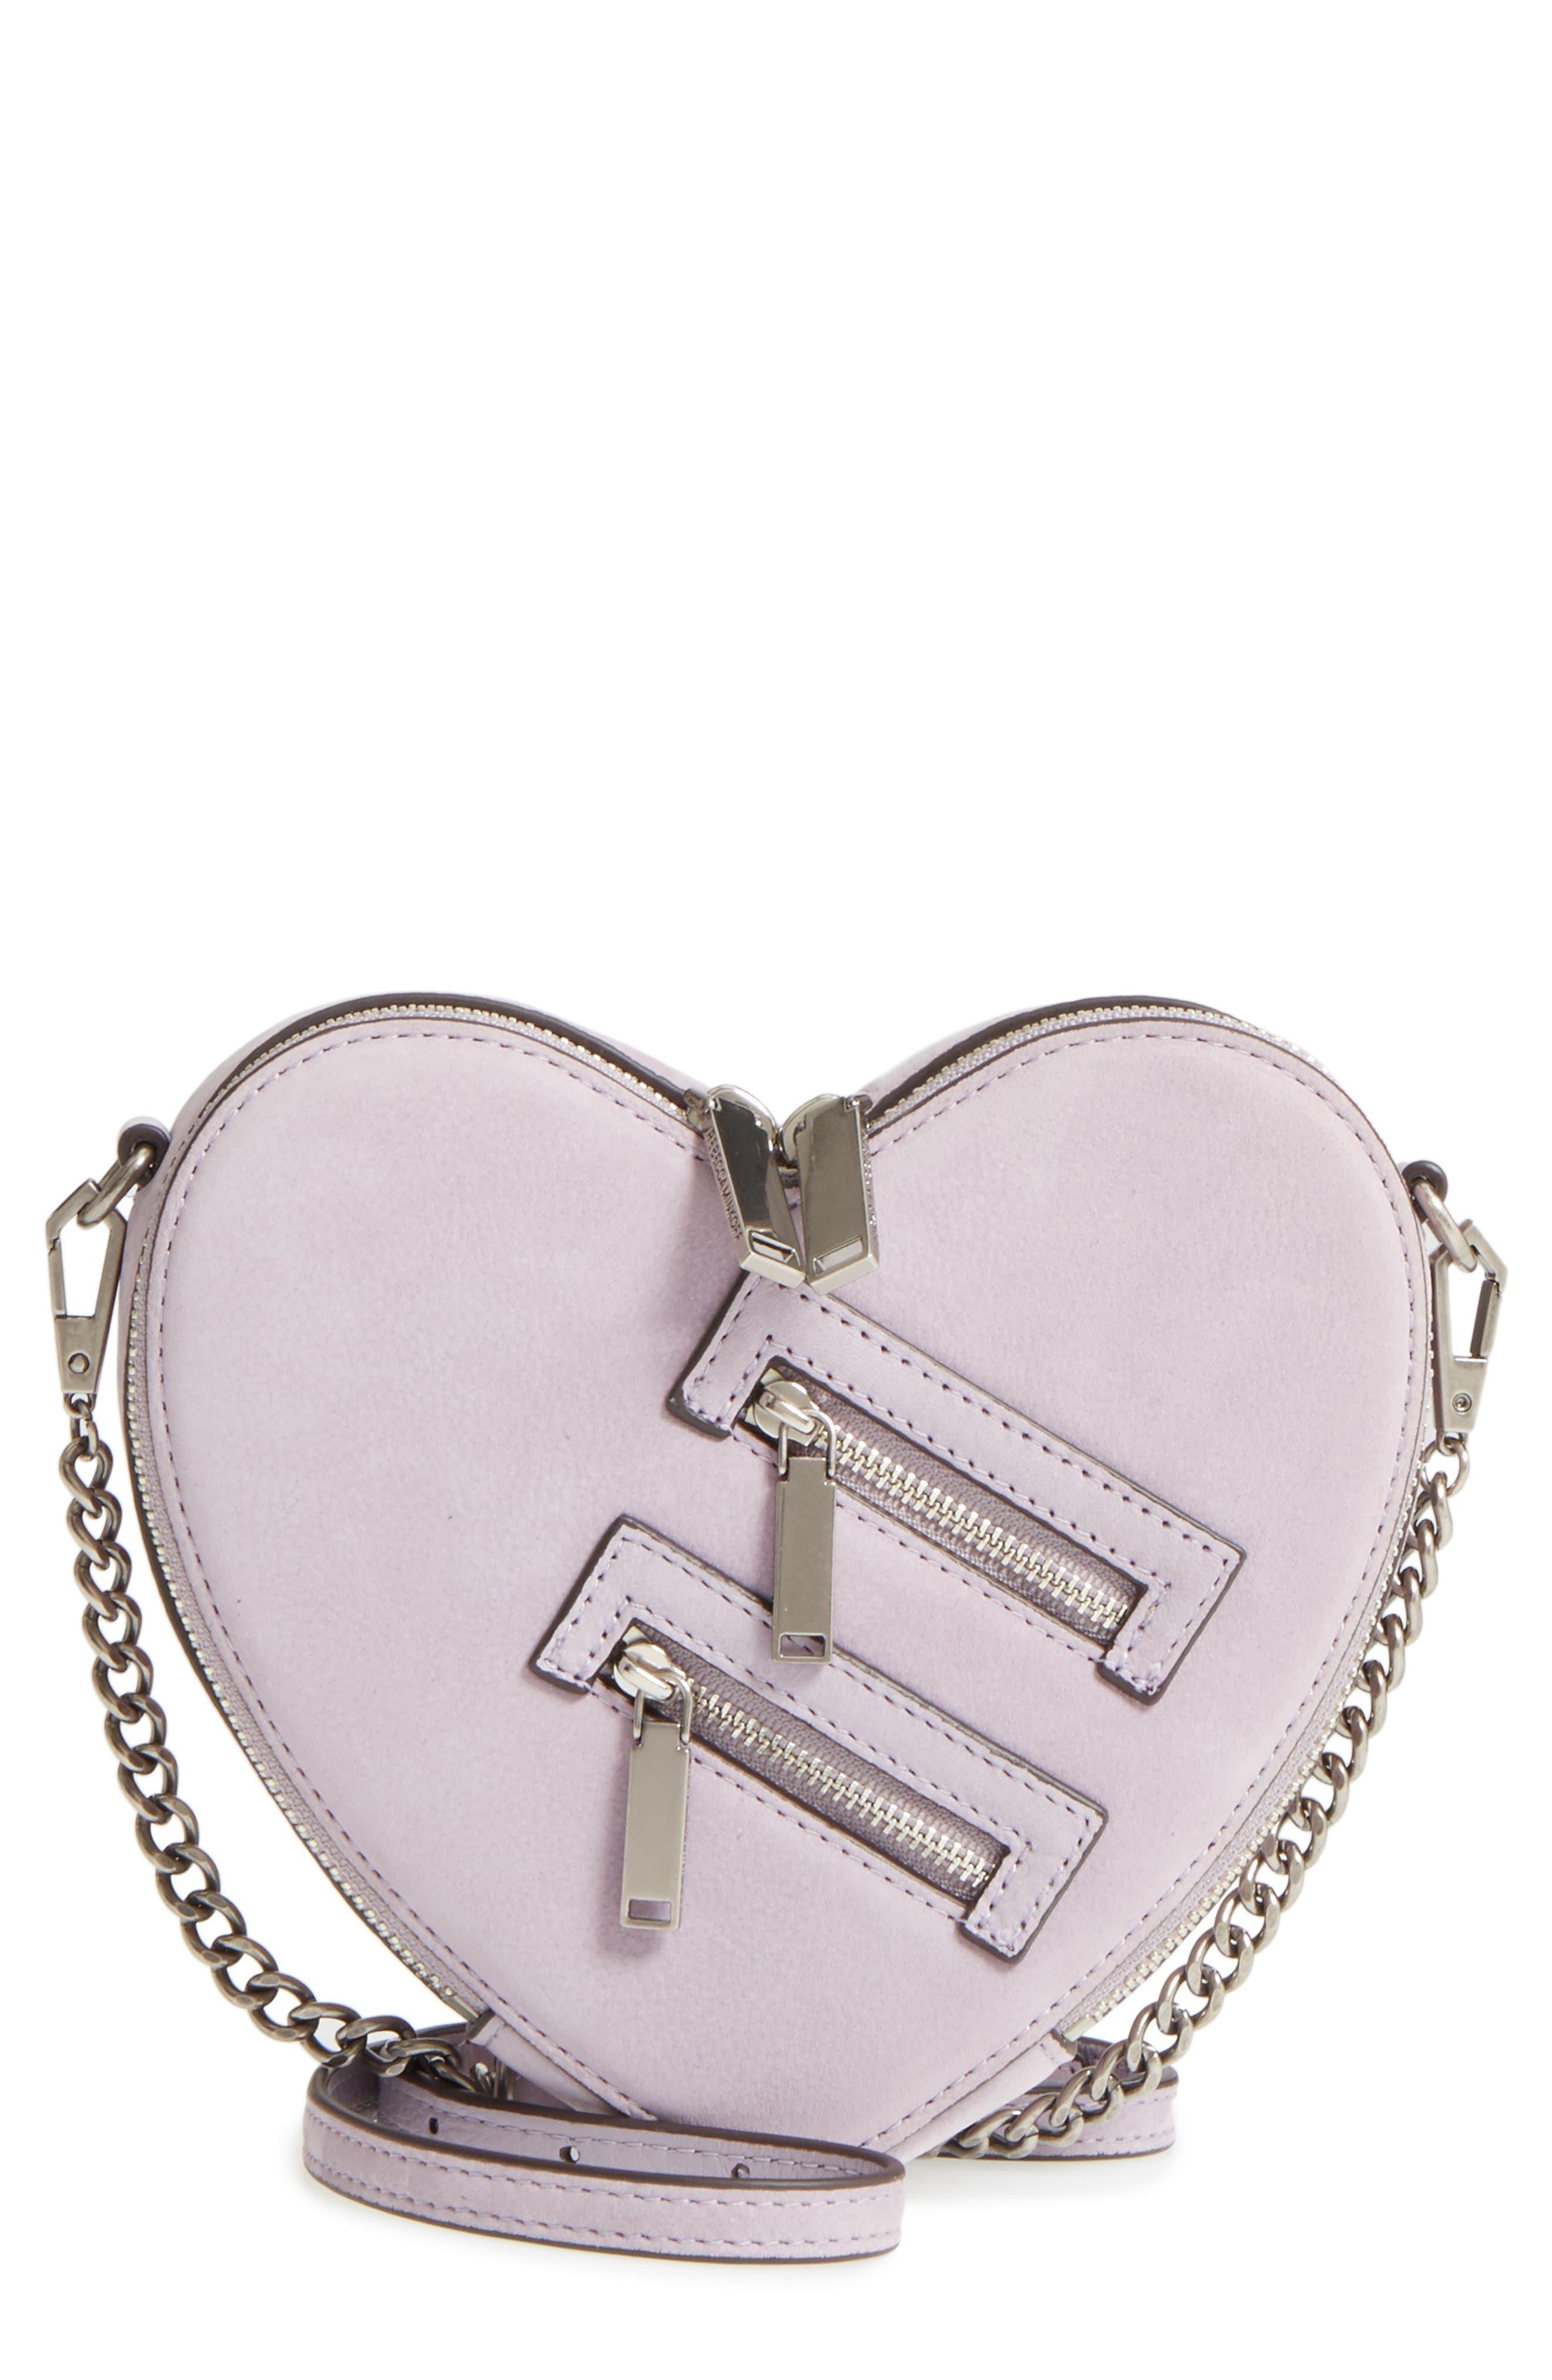 Main Image - Rebecca Minkoff Jamie Heart Leather Crossbody Bag